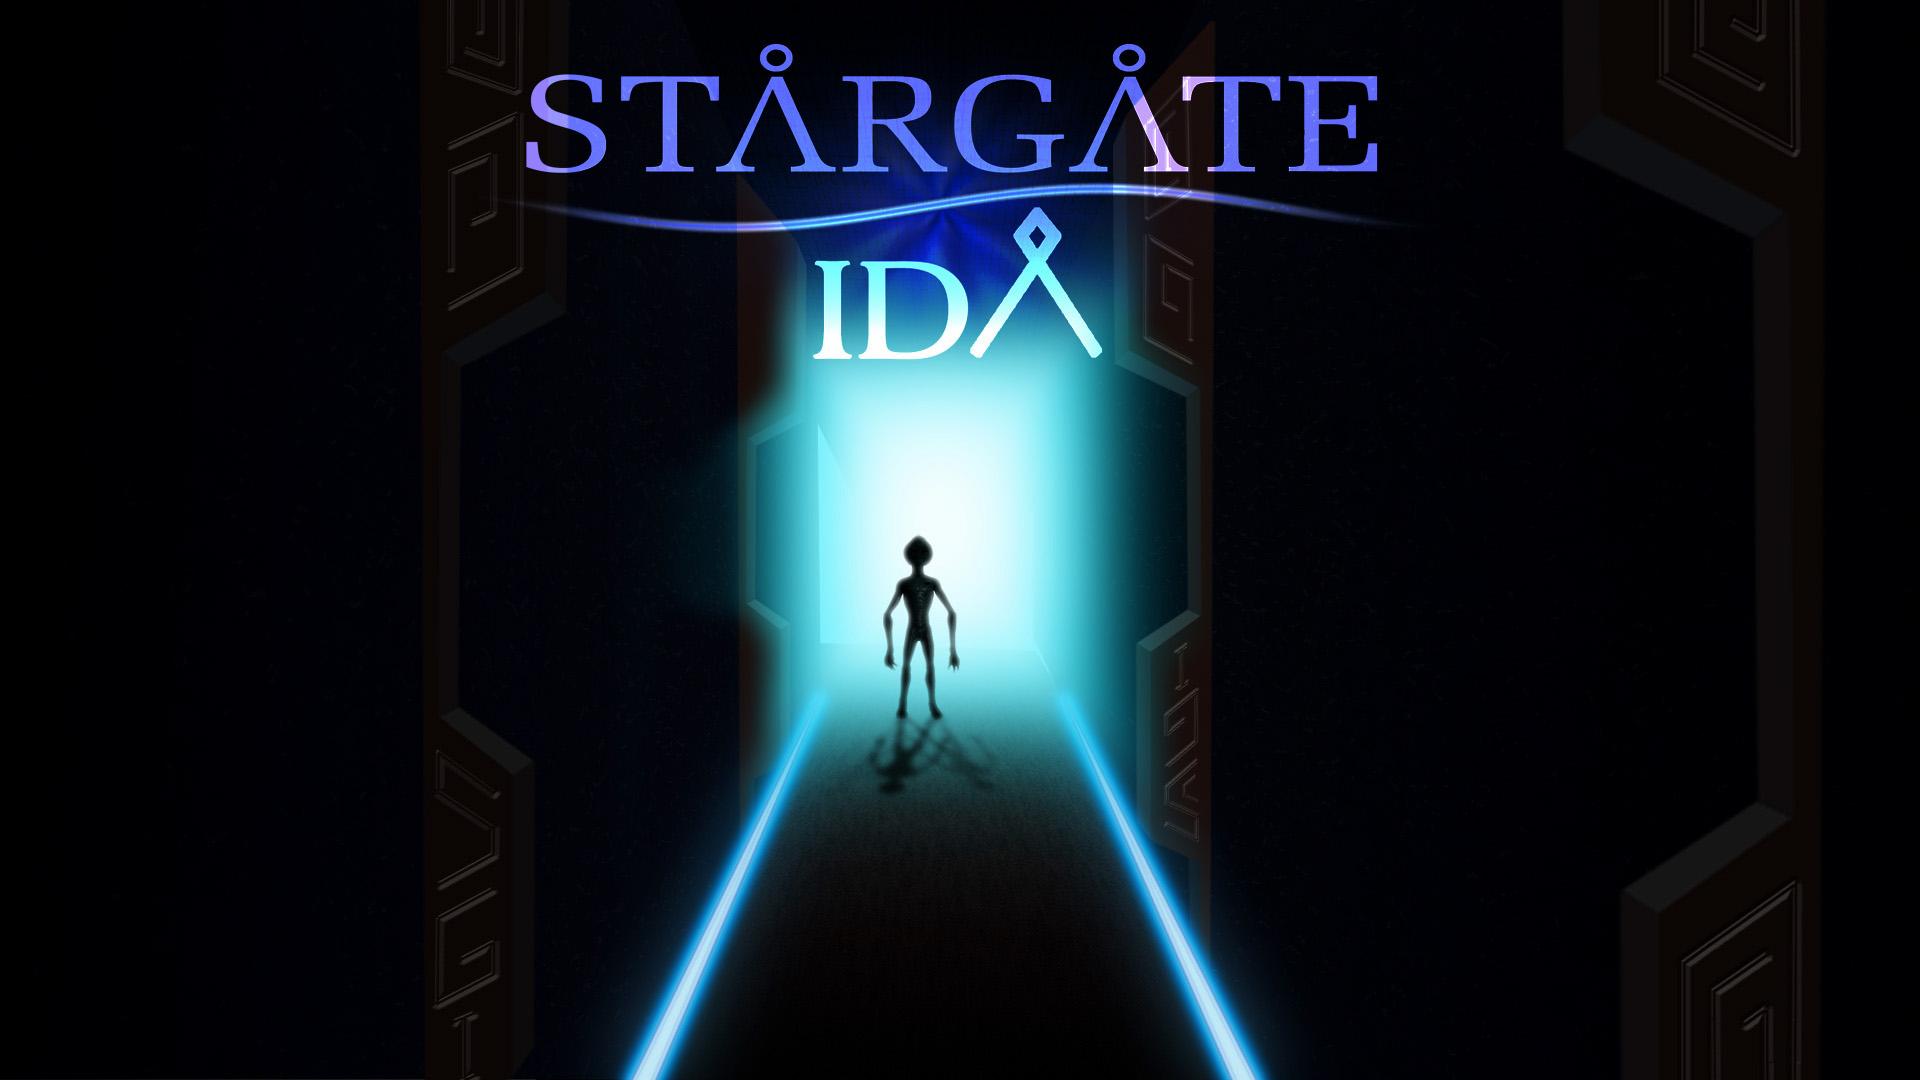 Stargate Ida